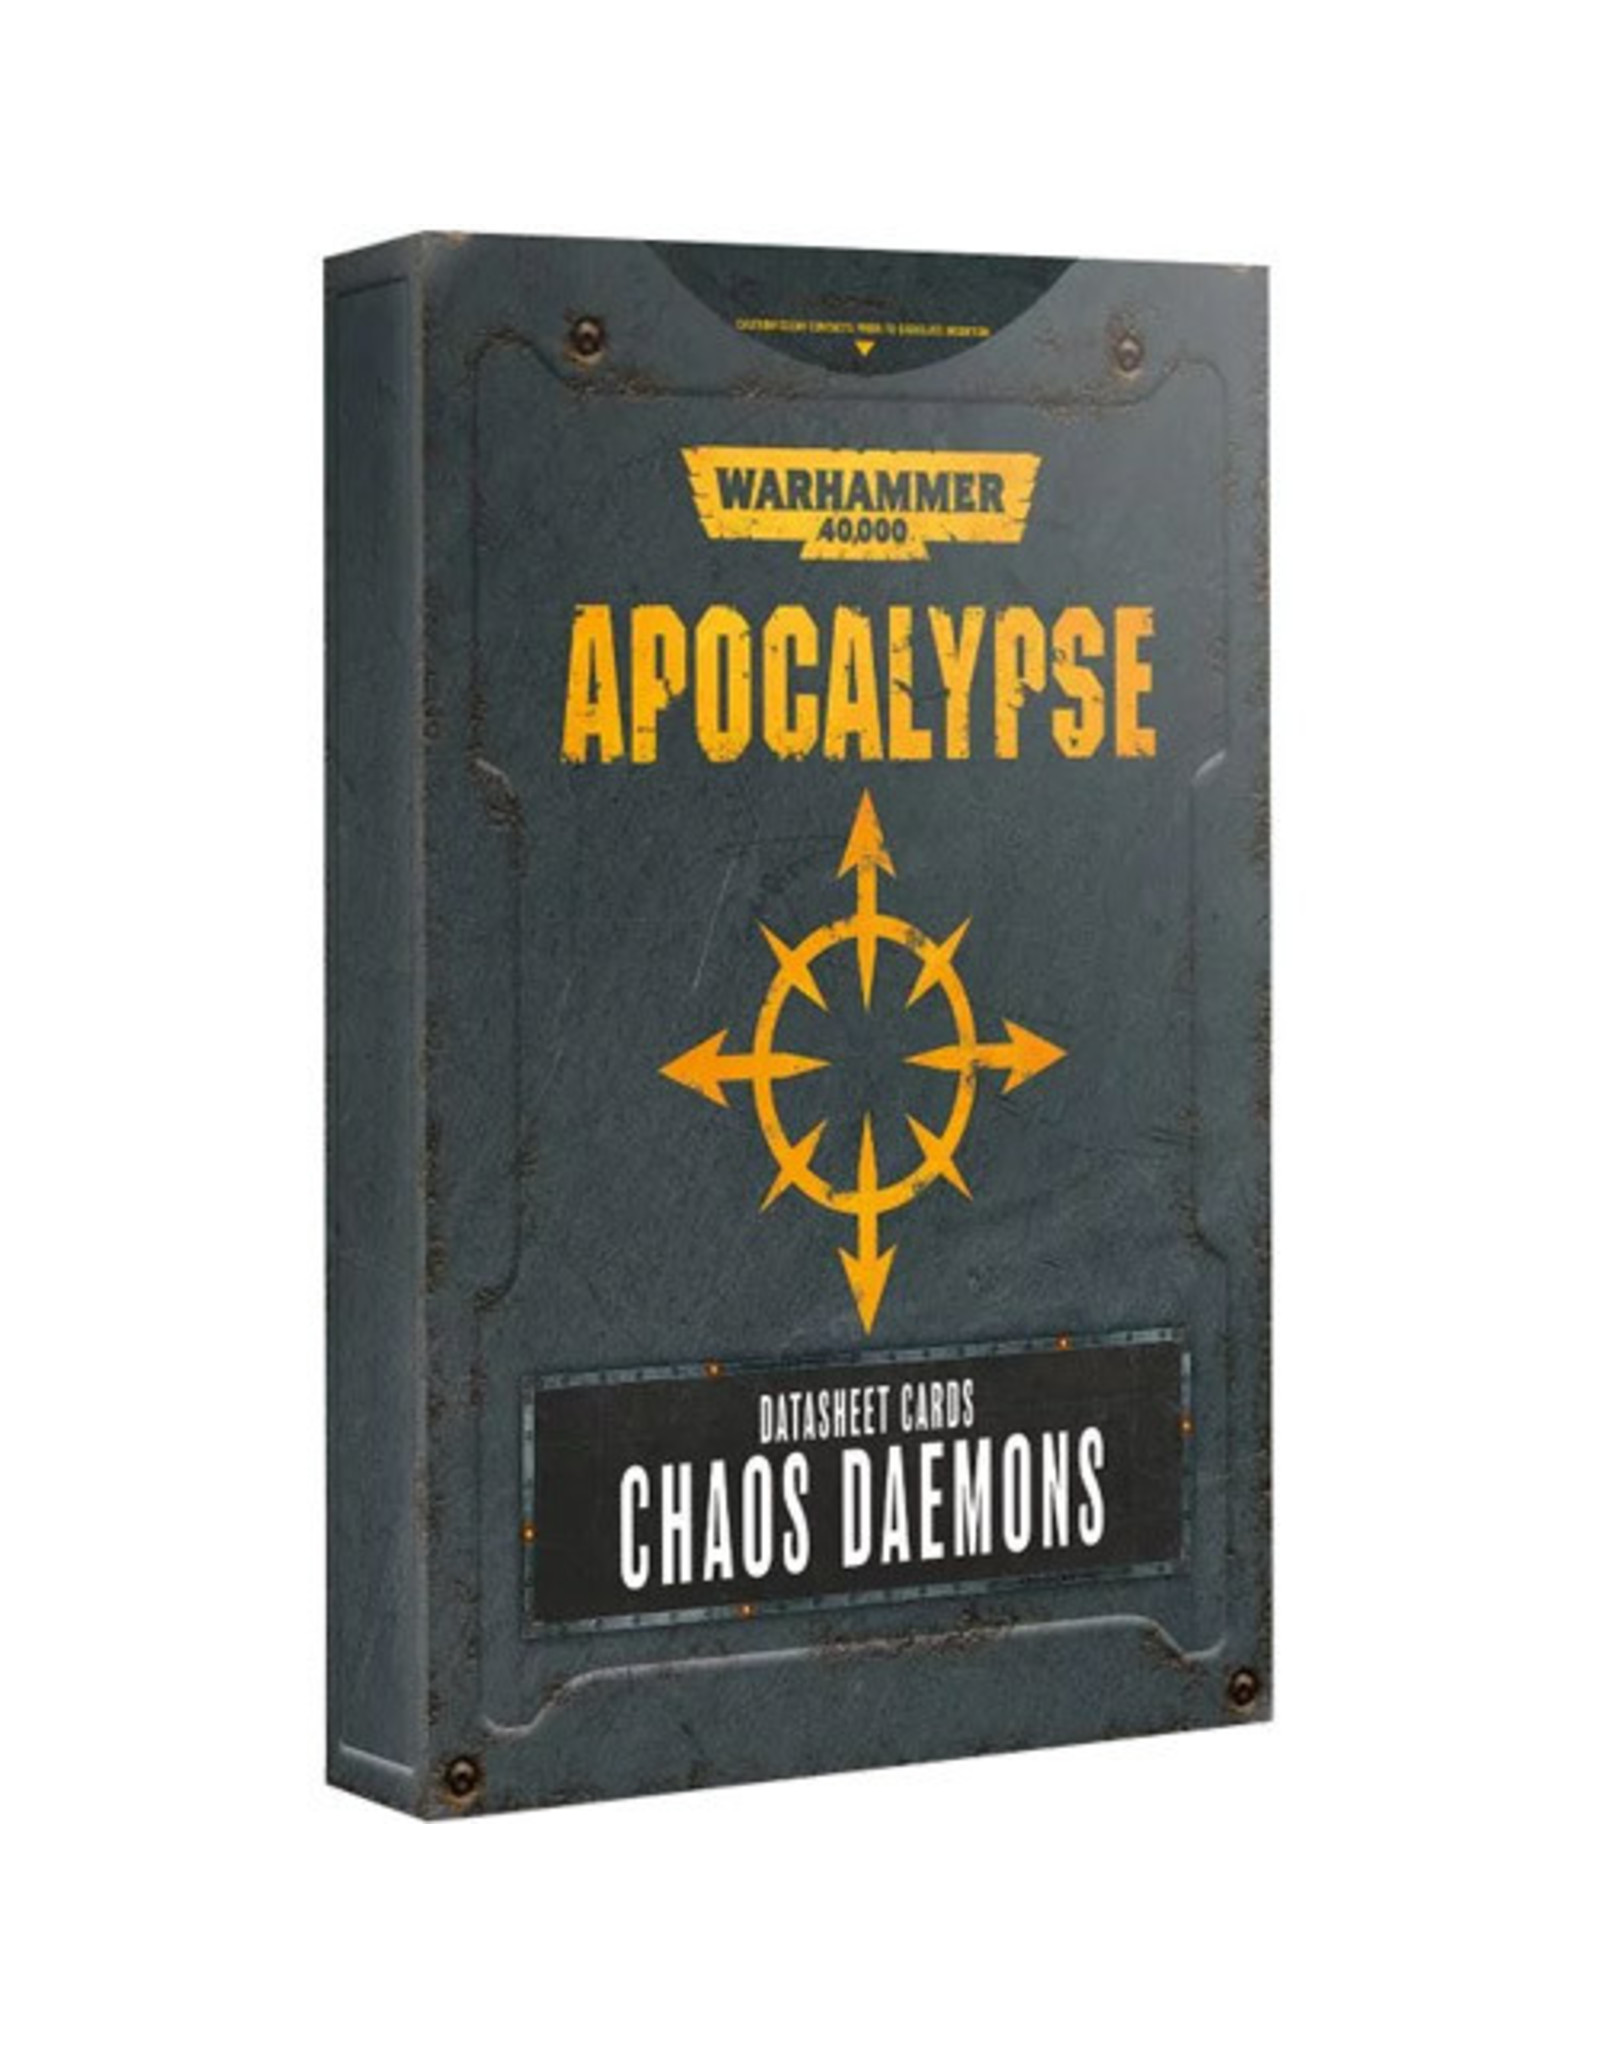 Games Workshop Apocalypse: Chaos Daemon DataSheets